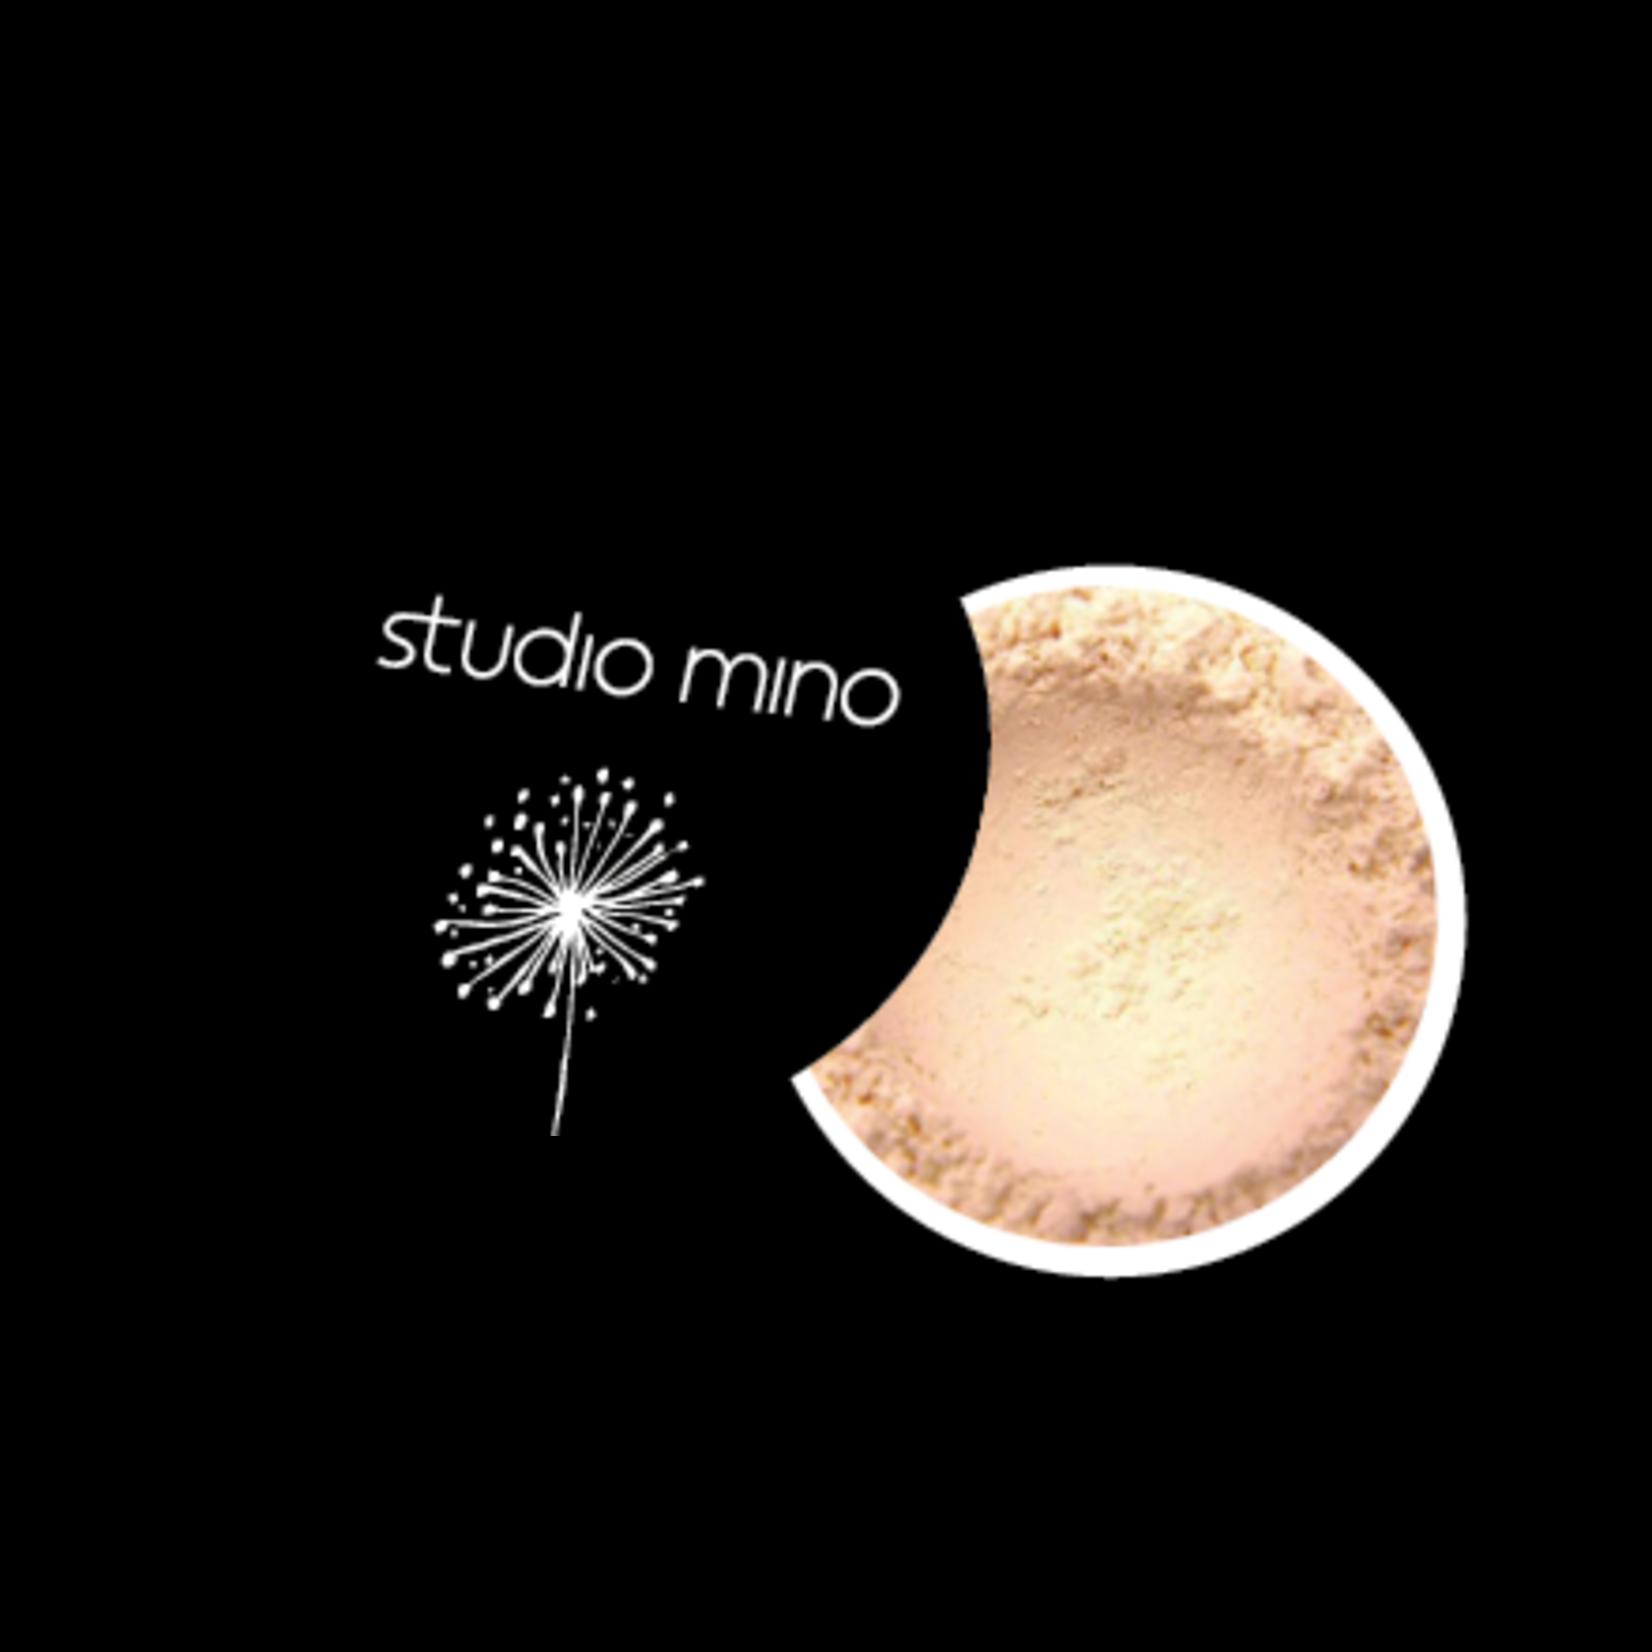 Studio mino Afwerkingspoeder of finshing powder transparant